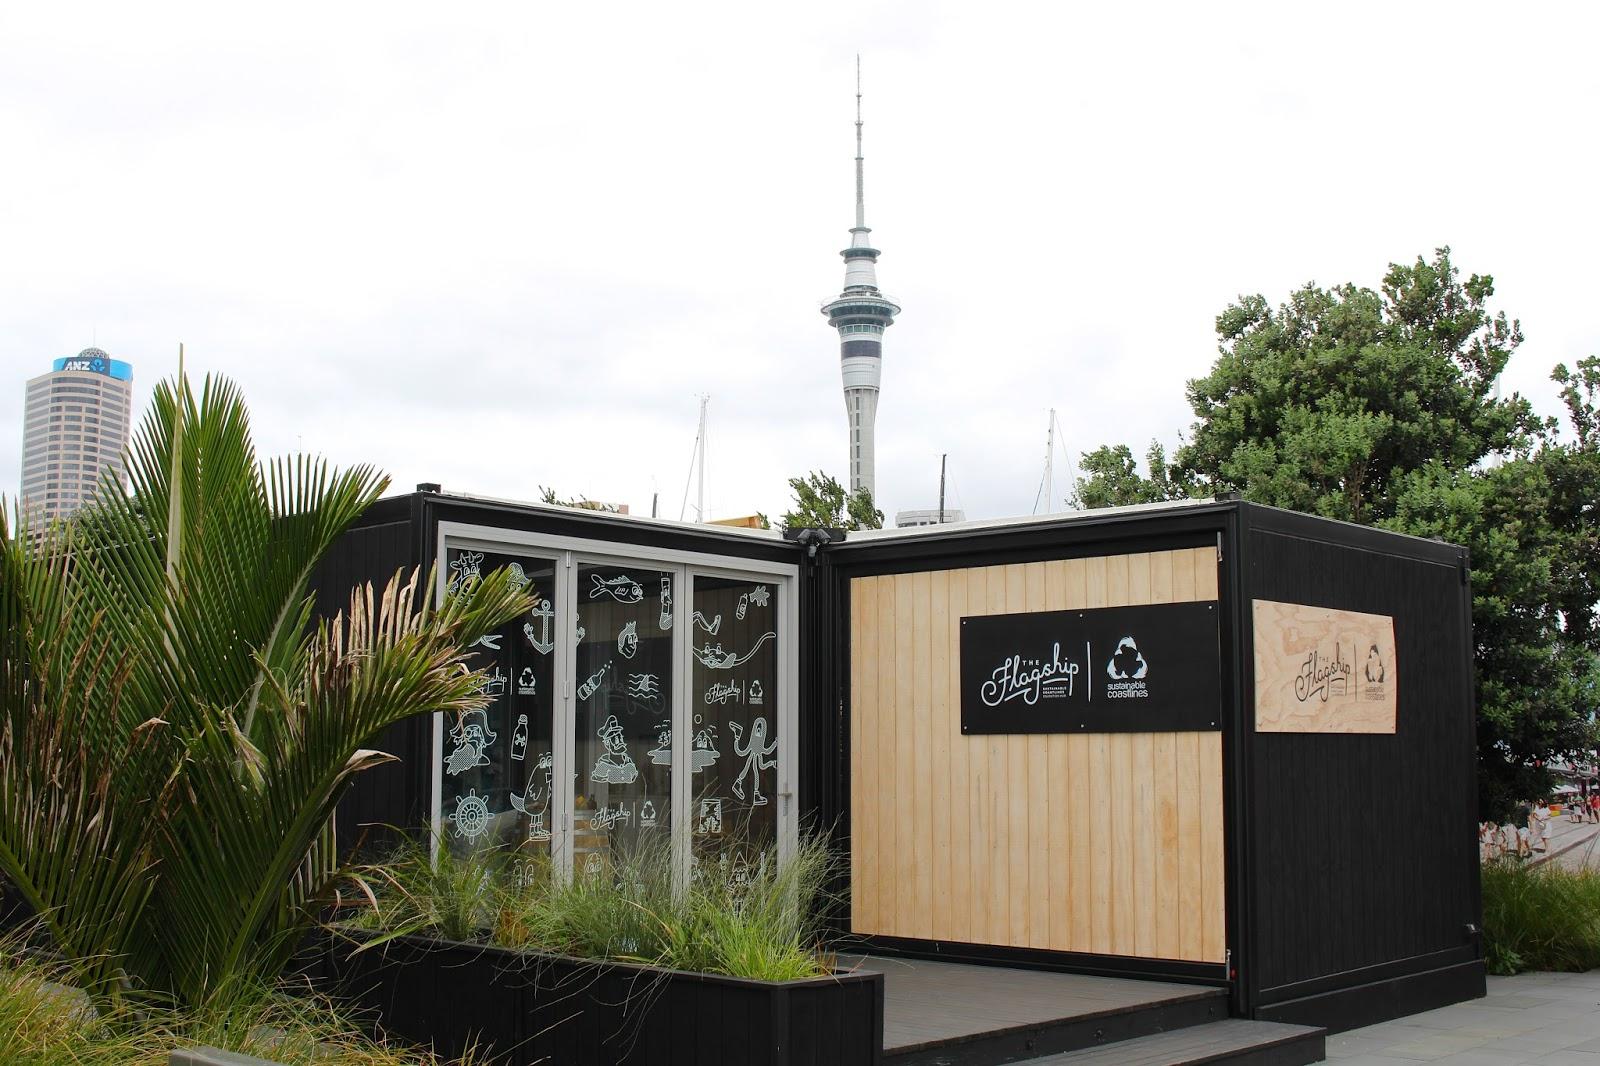 Auckland Hotspot guide - Wynyard Quarter